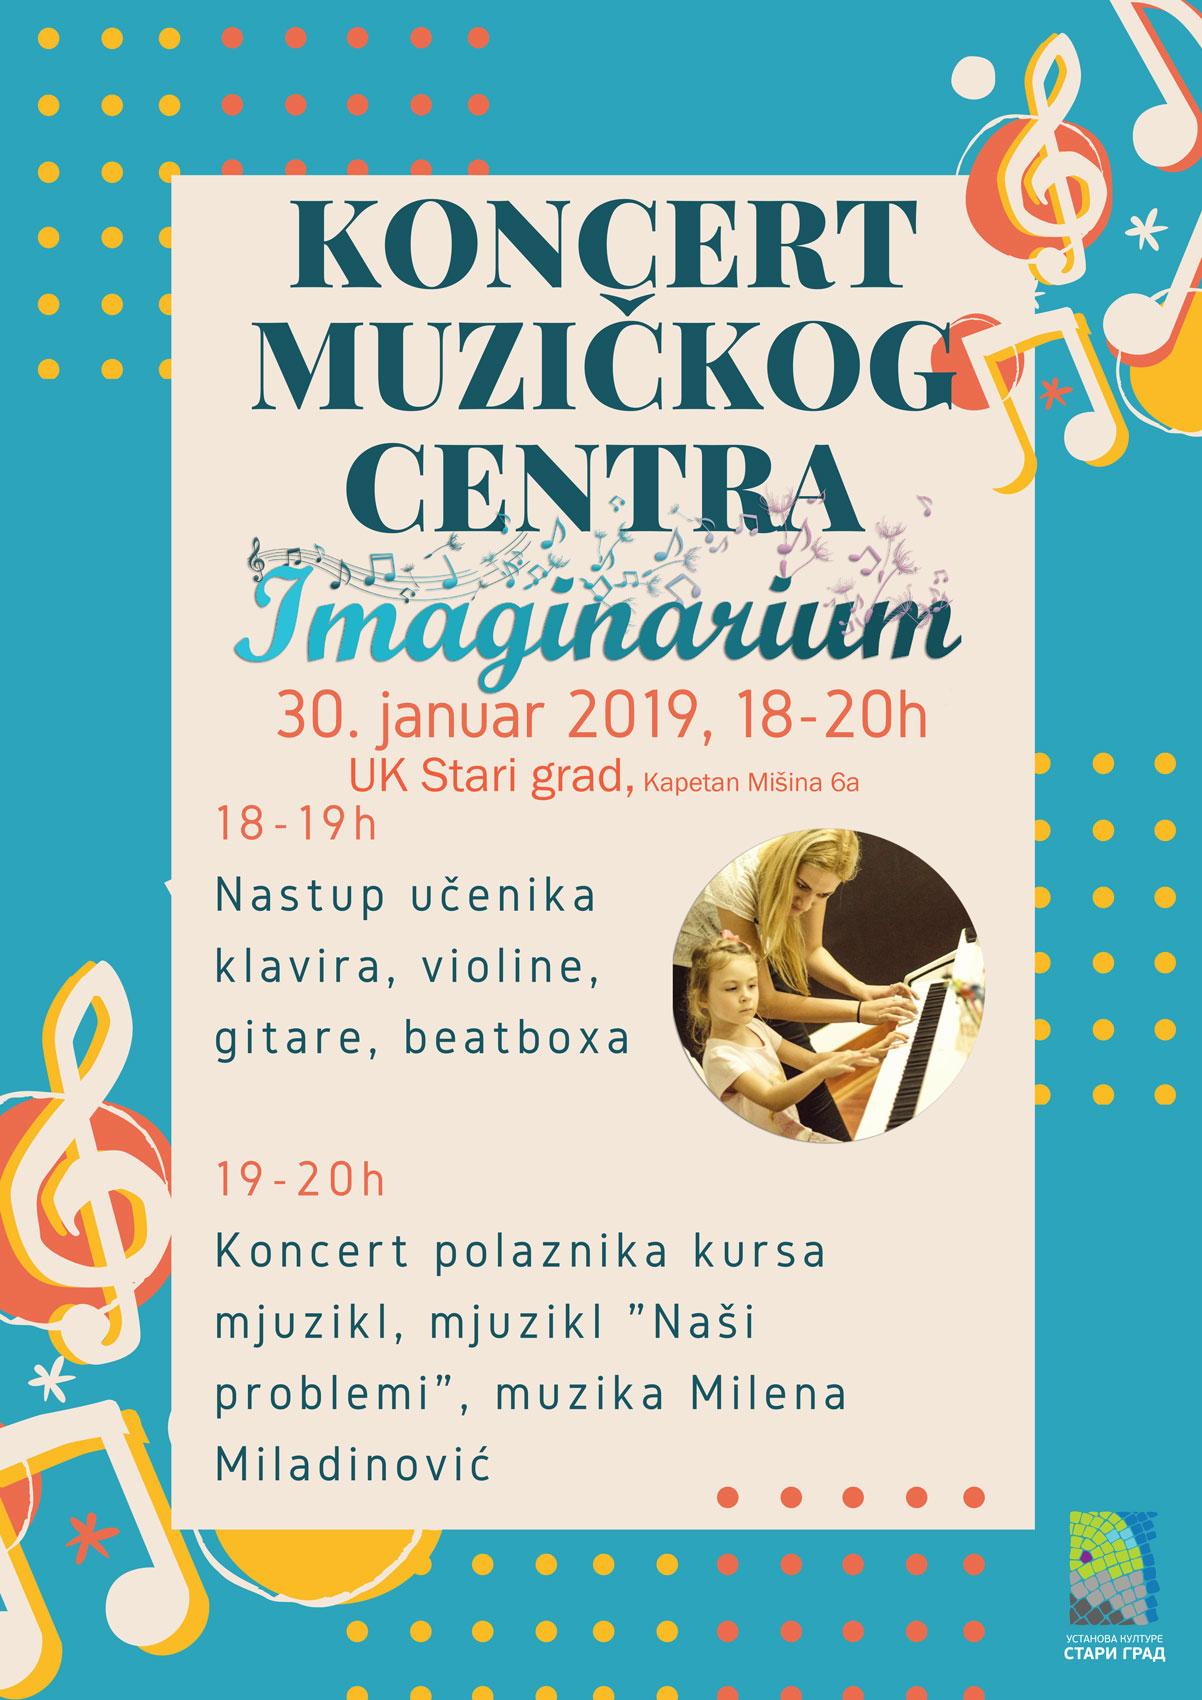 "Koncert muzičkog centra ""Imaginarijum"""